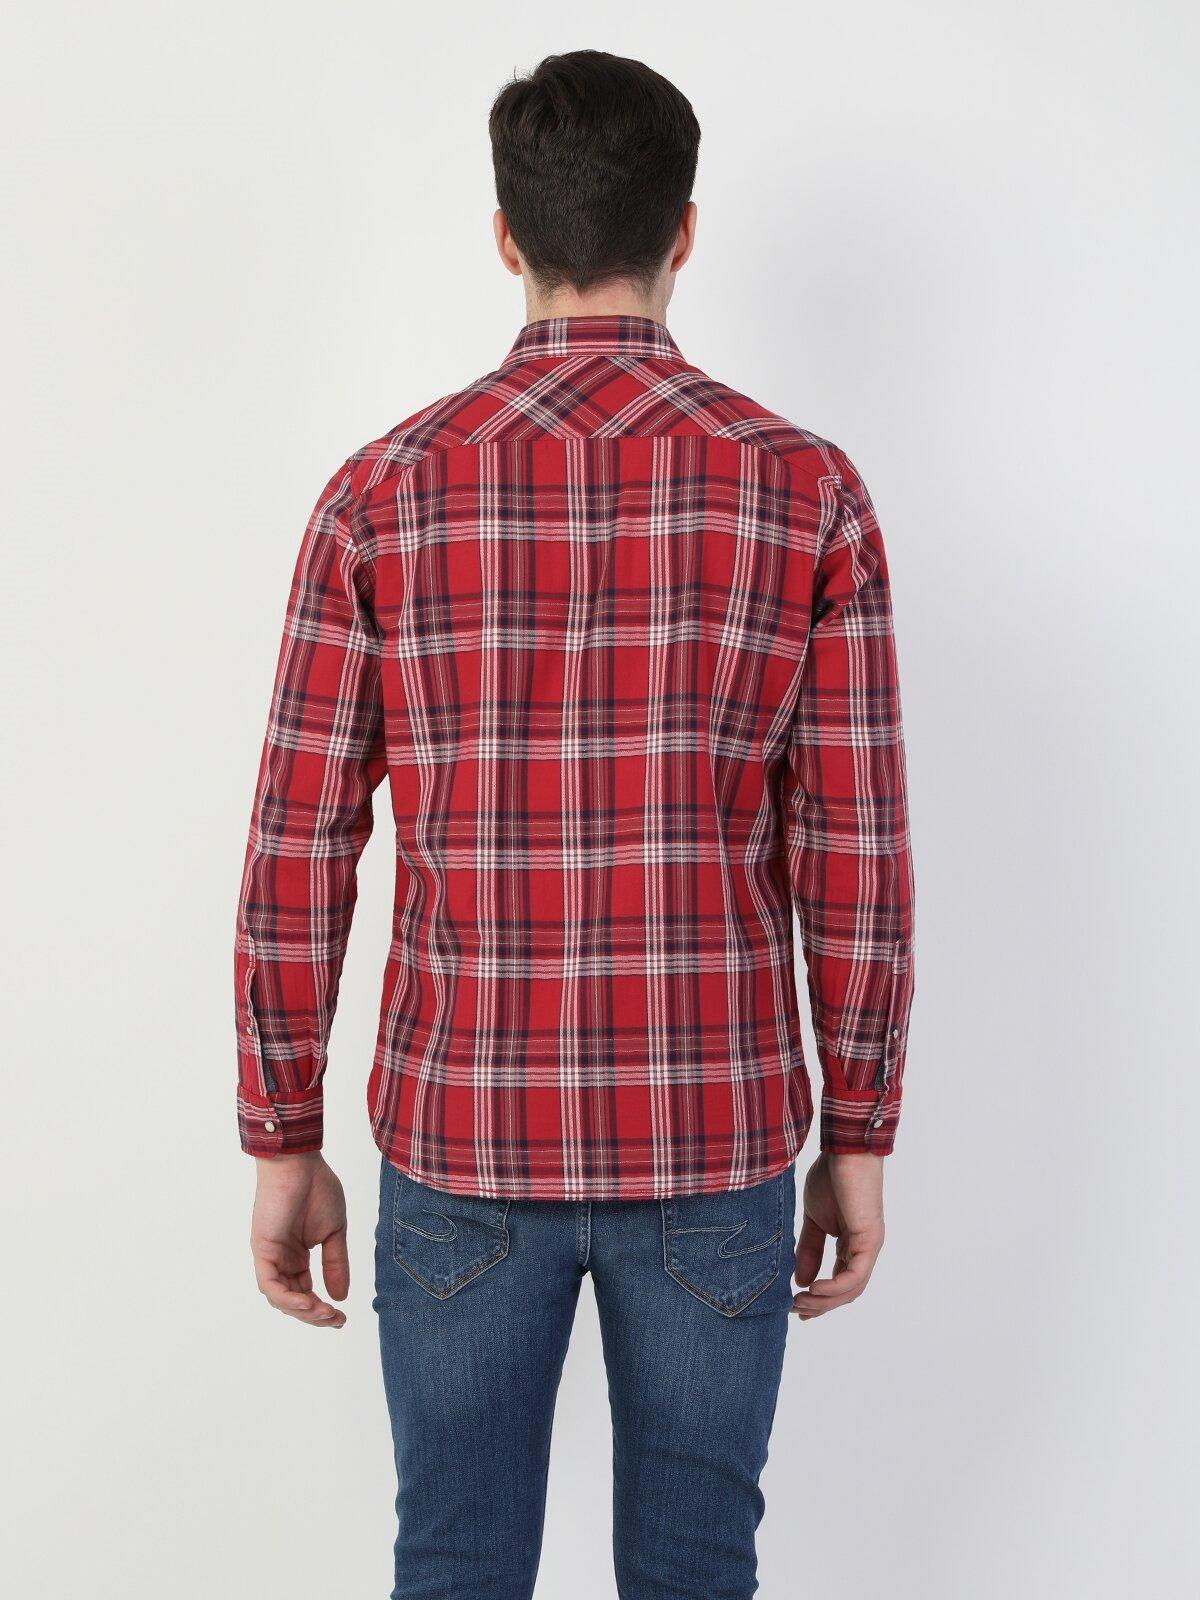 Regular Fit Shirt Neck Erkek Kırmızı Uzun Kol Gömlek